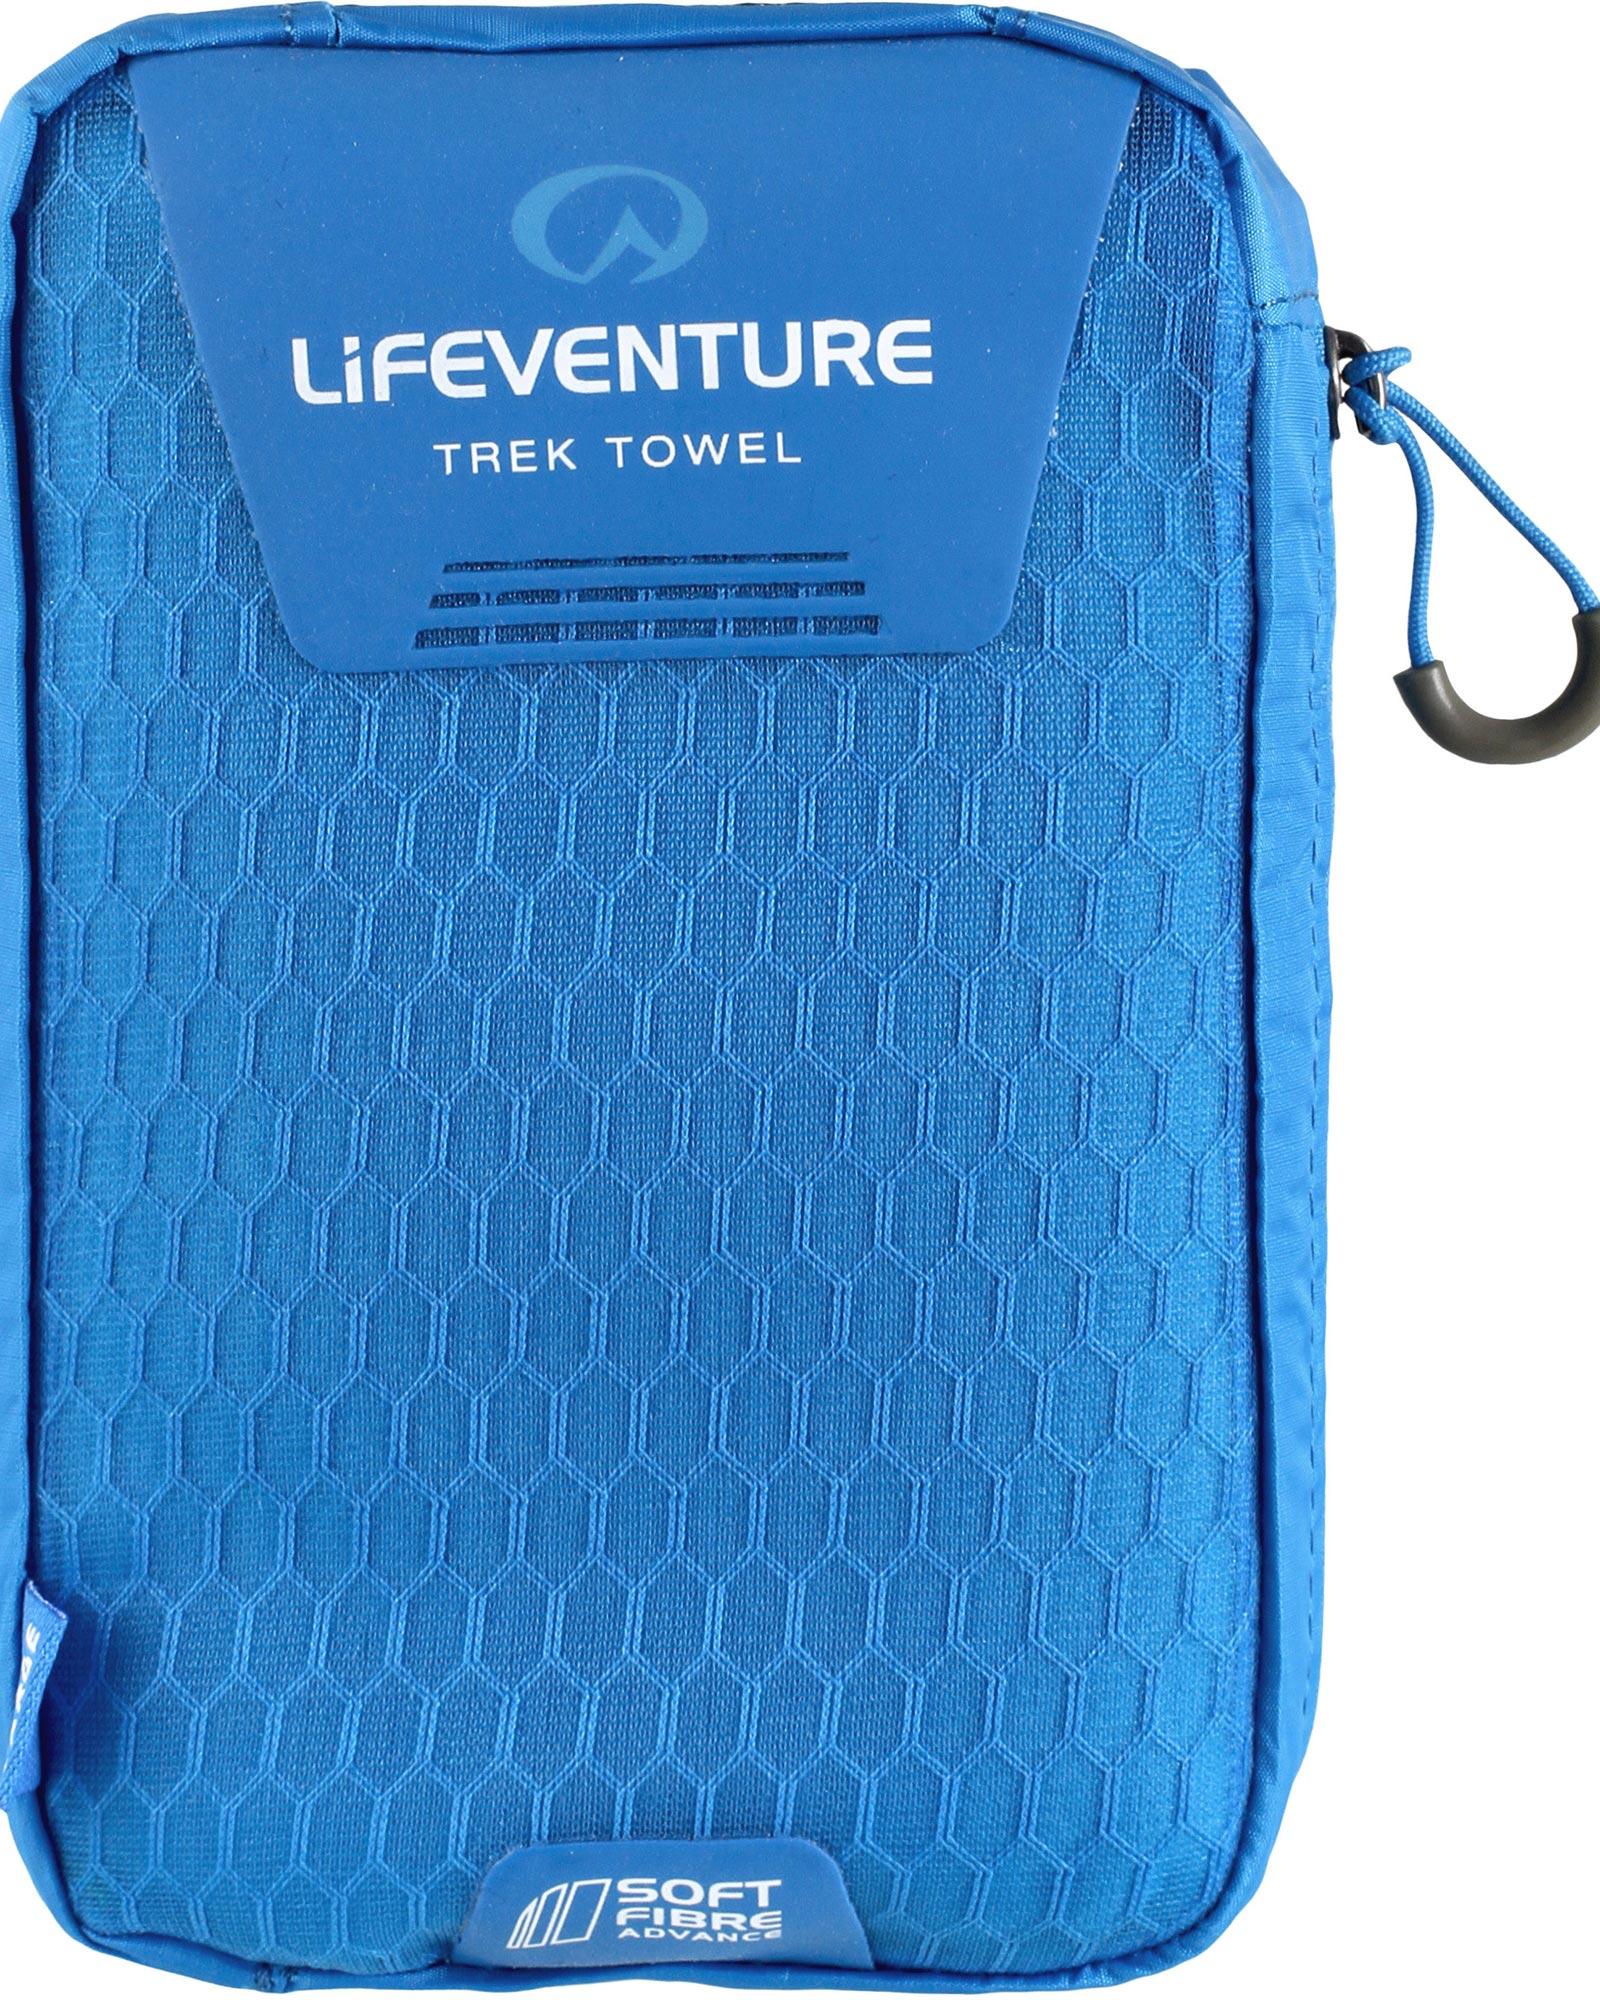 Product image of Lifeventure Soft Fibre Trek Towel - Large